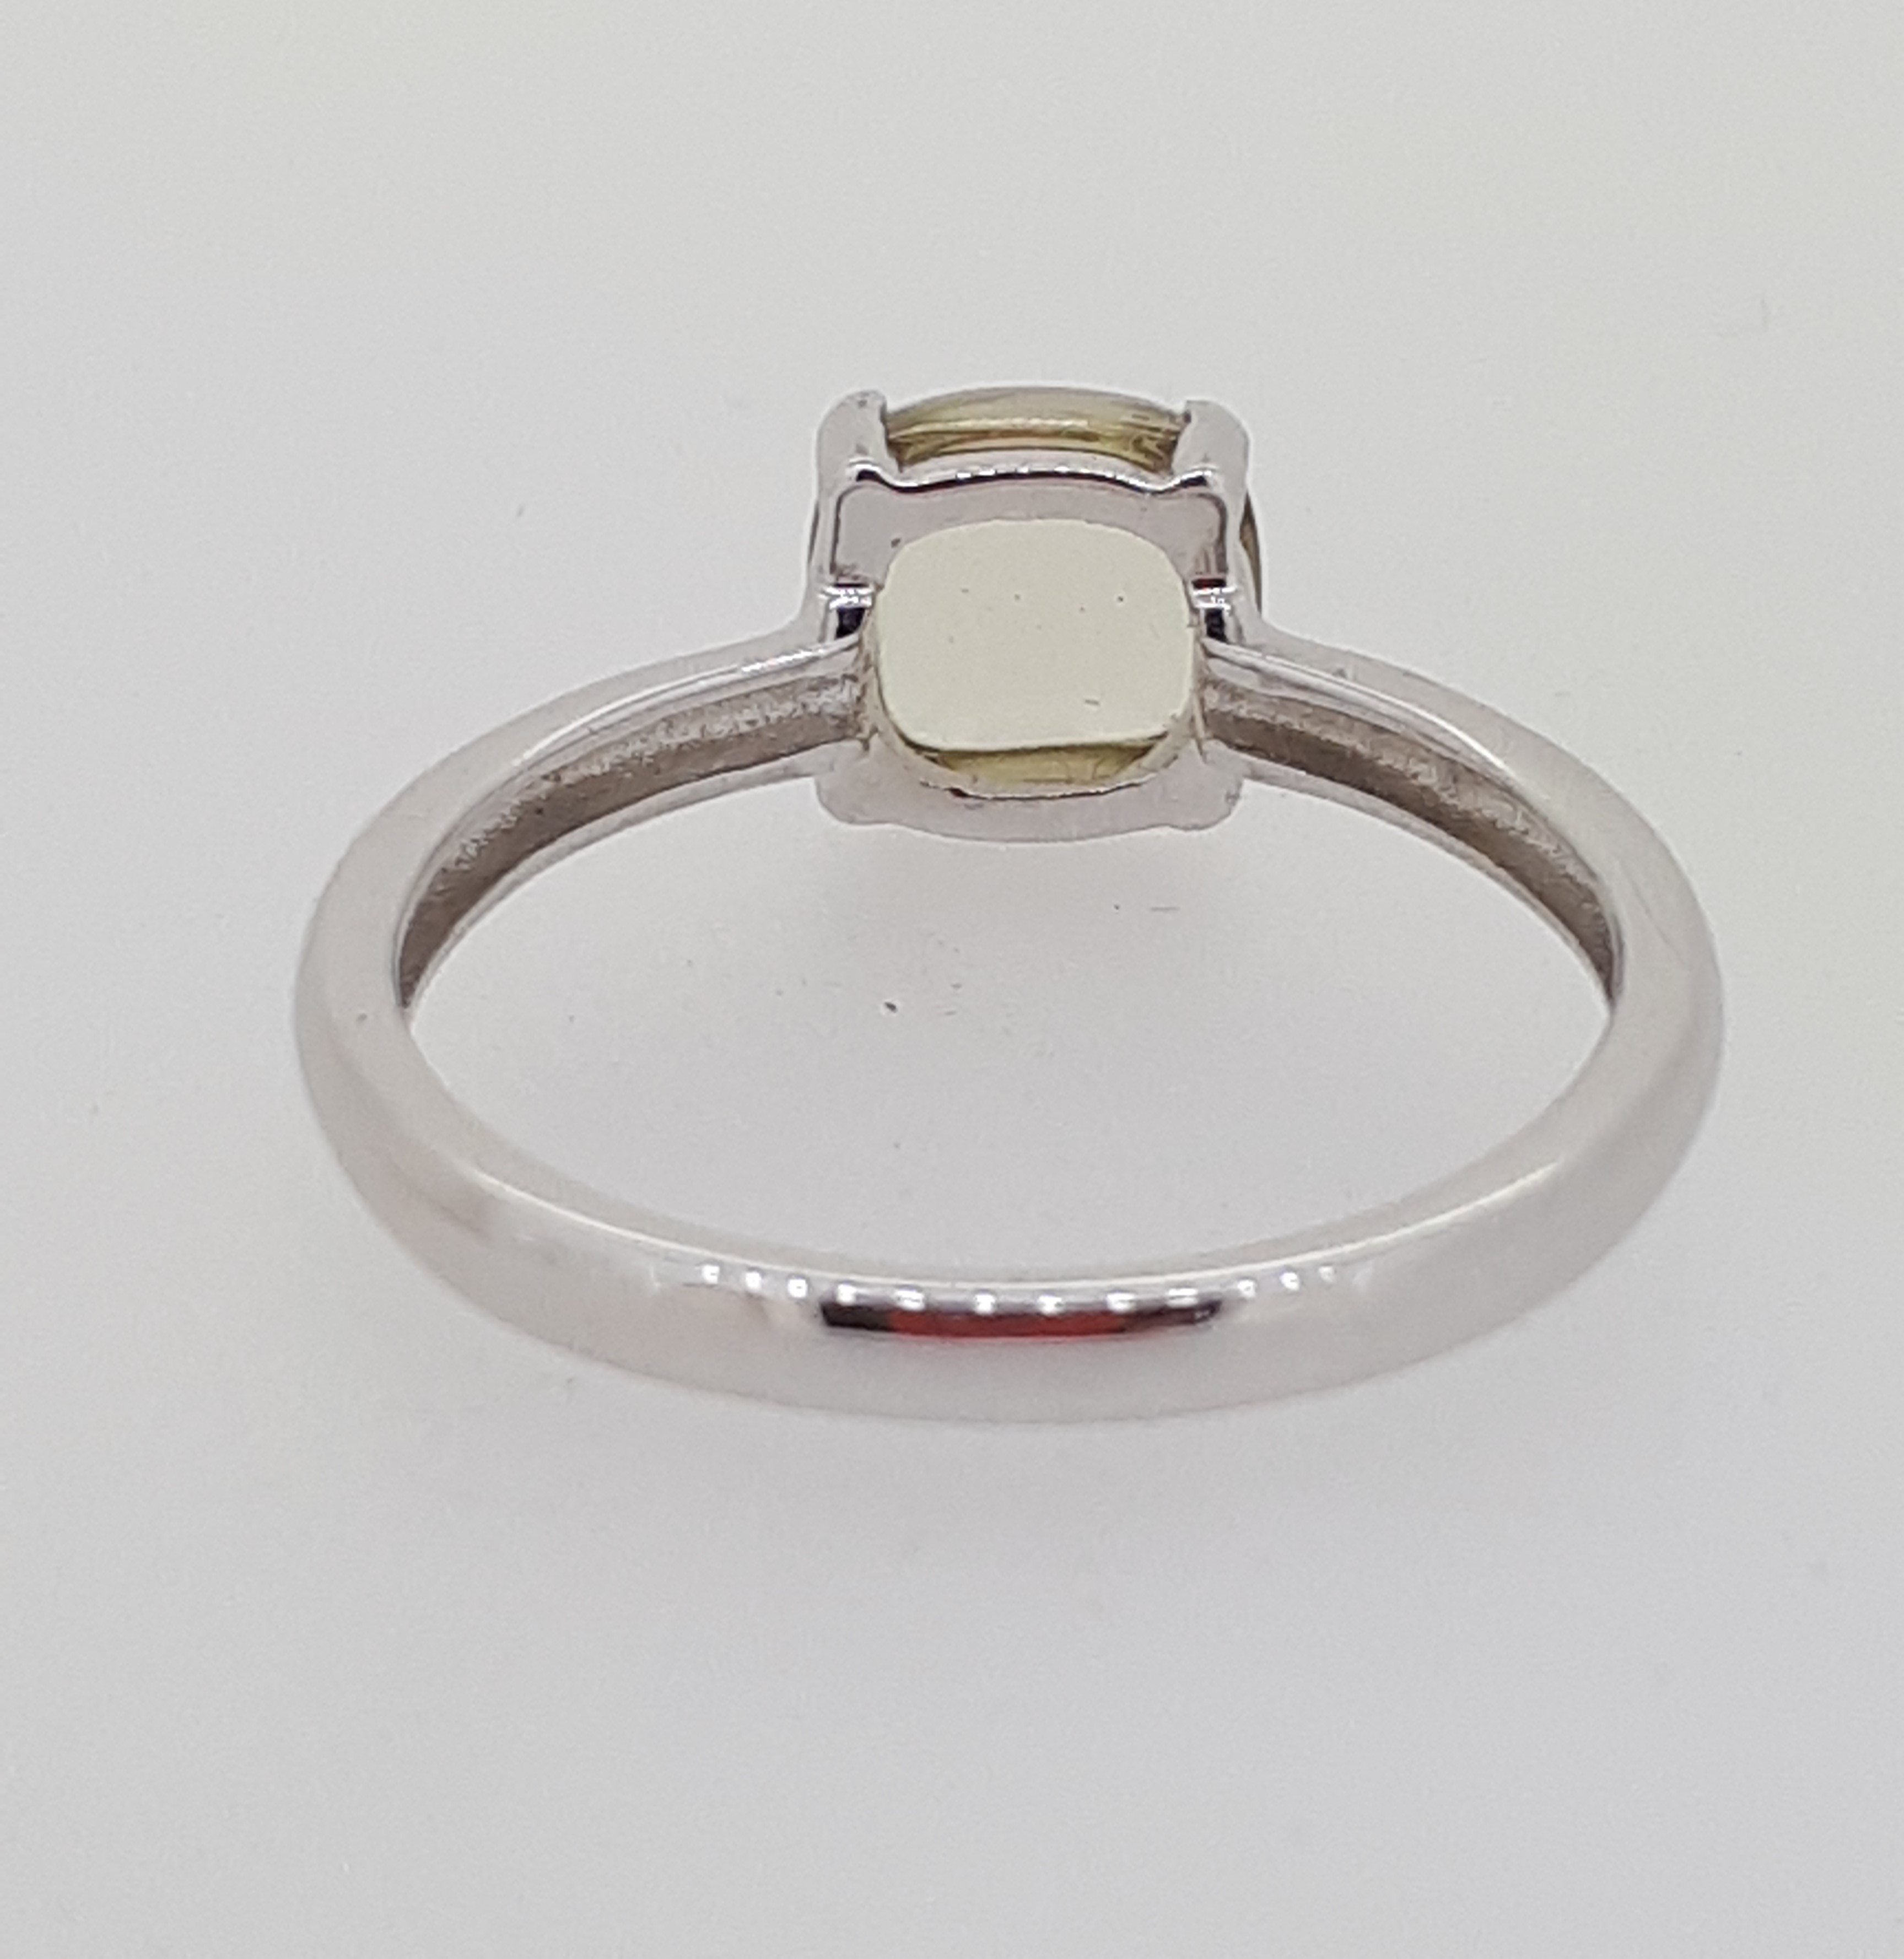 9ct (375) White Gold Lemon Quartz Cabochon Four Claw Ring - Image 4 of 4